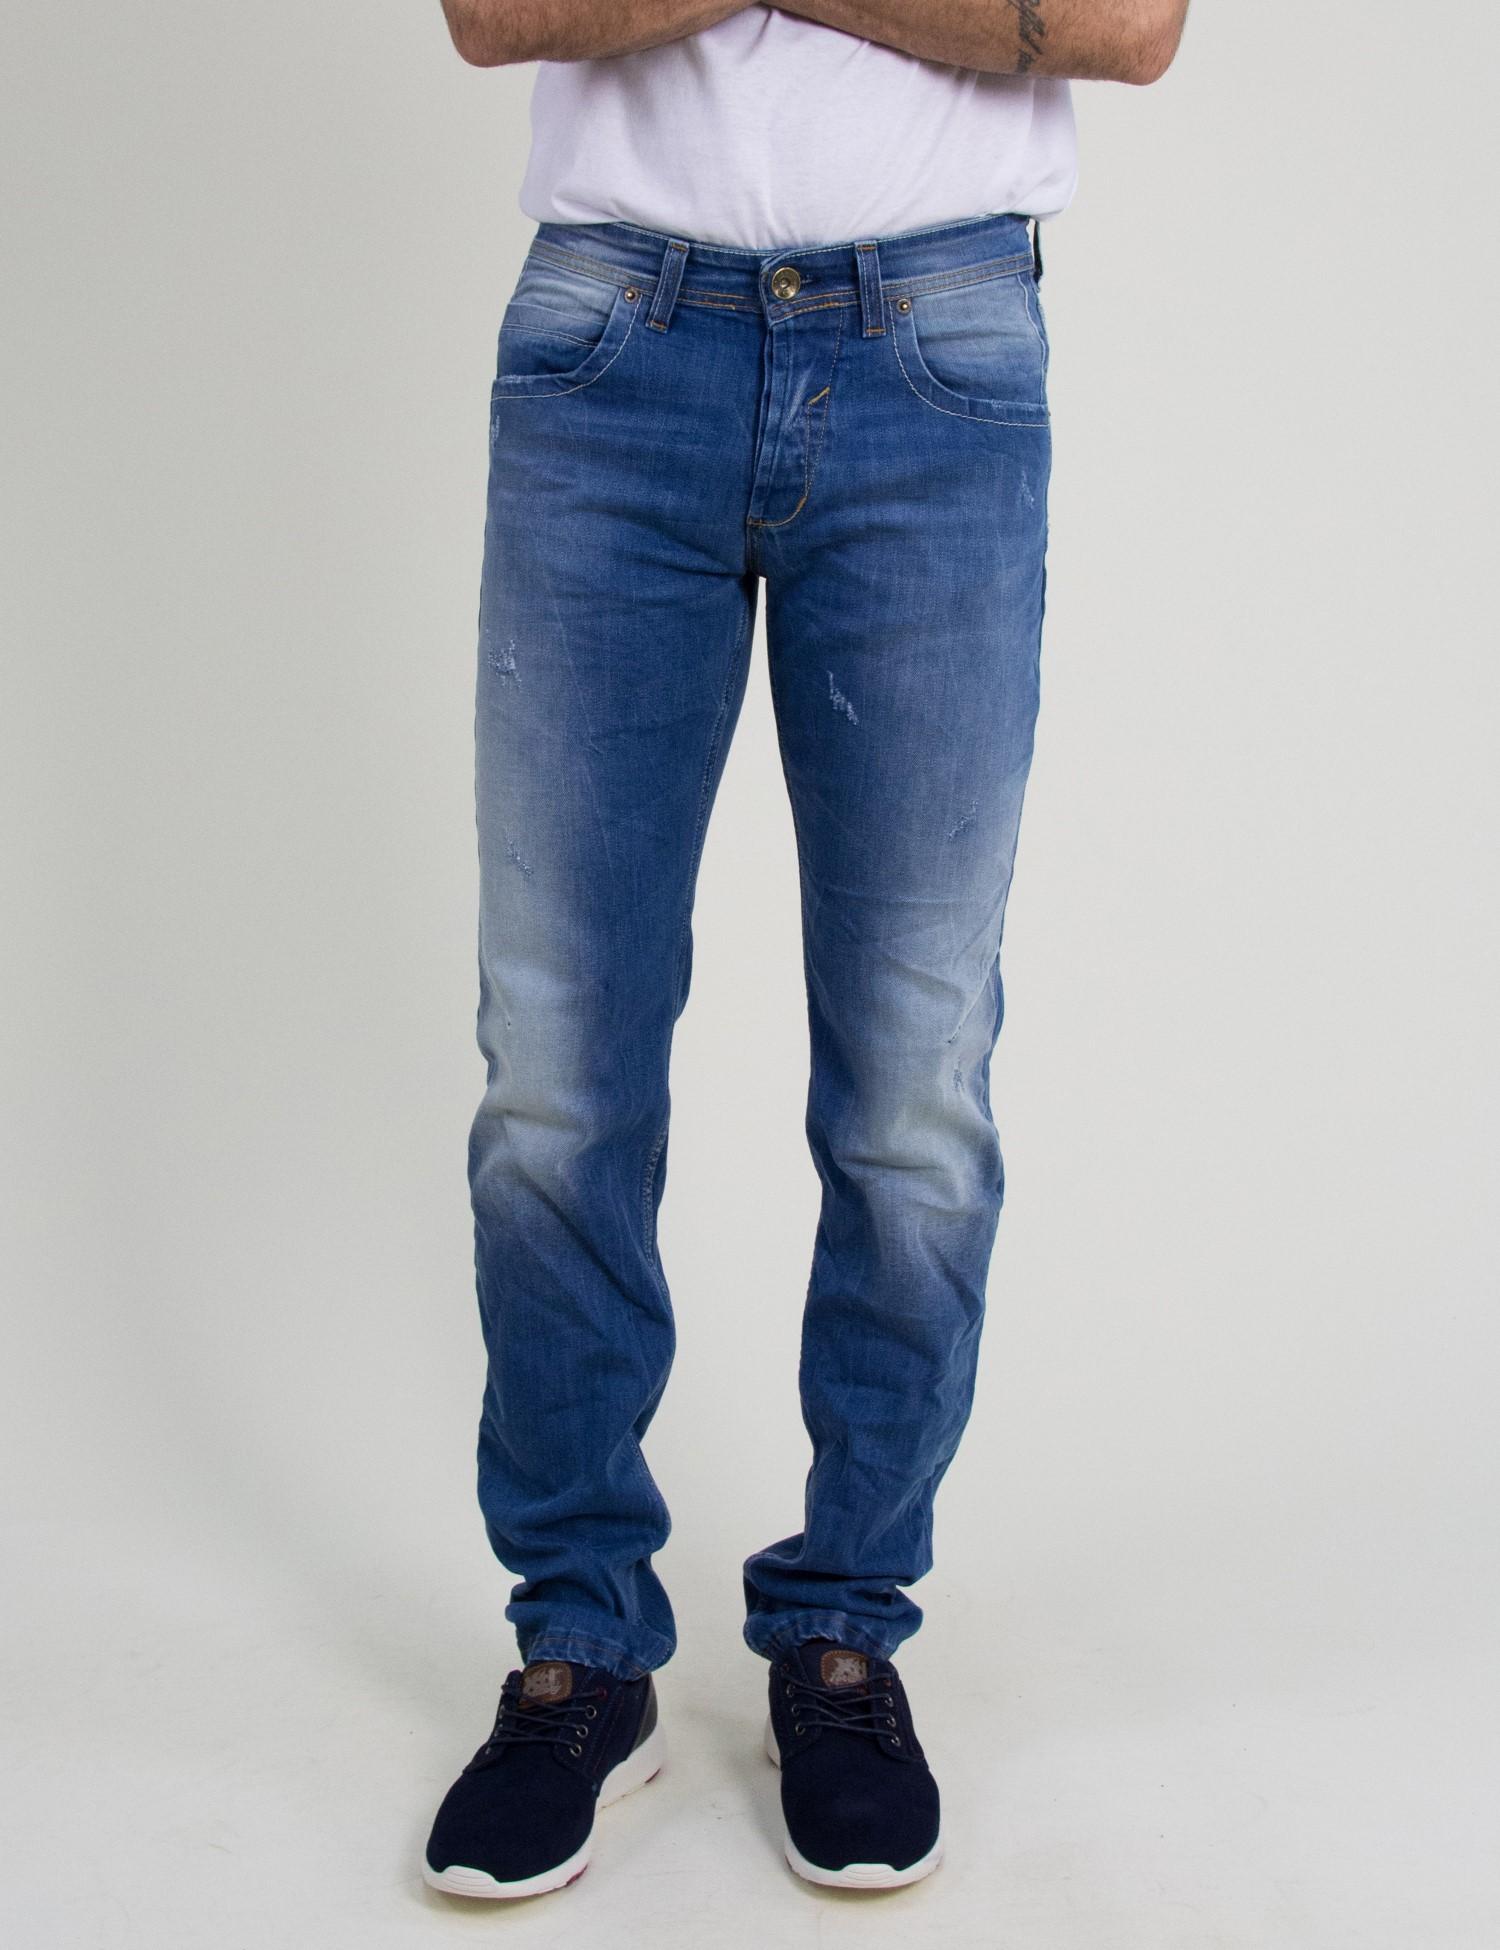 8899e81a03f5 Ανδρικό τζιν παντελόνι Trial μπλε φθορές ξεβάμματα Nathan 18